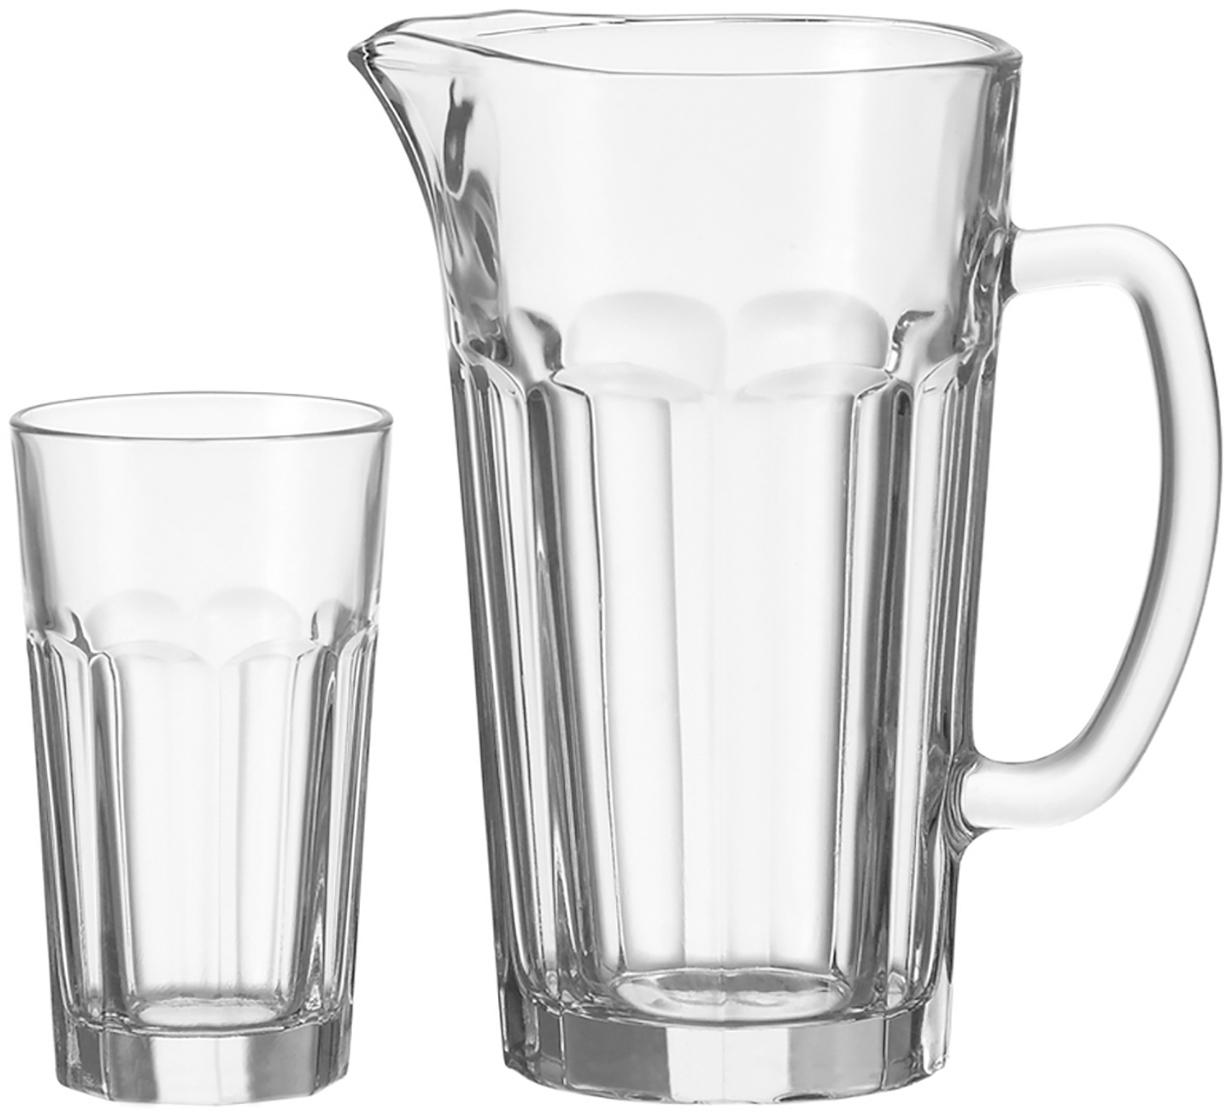 Krug Rock mit Gläsern, 7-tlg., Glas, Transparent, Sondergrößen